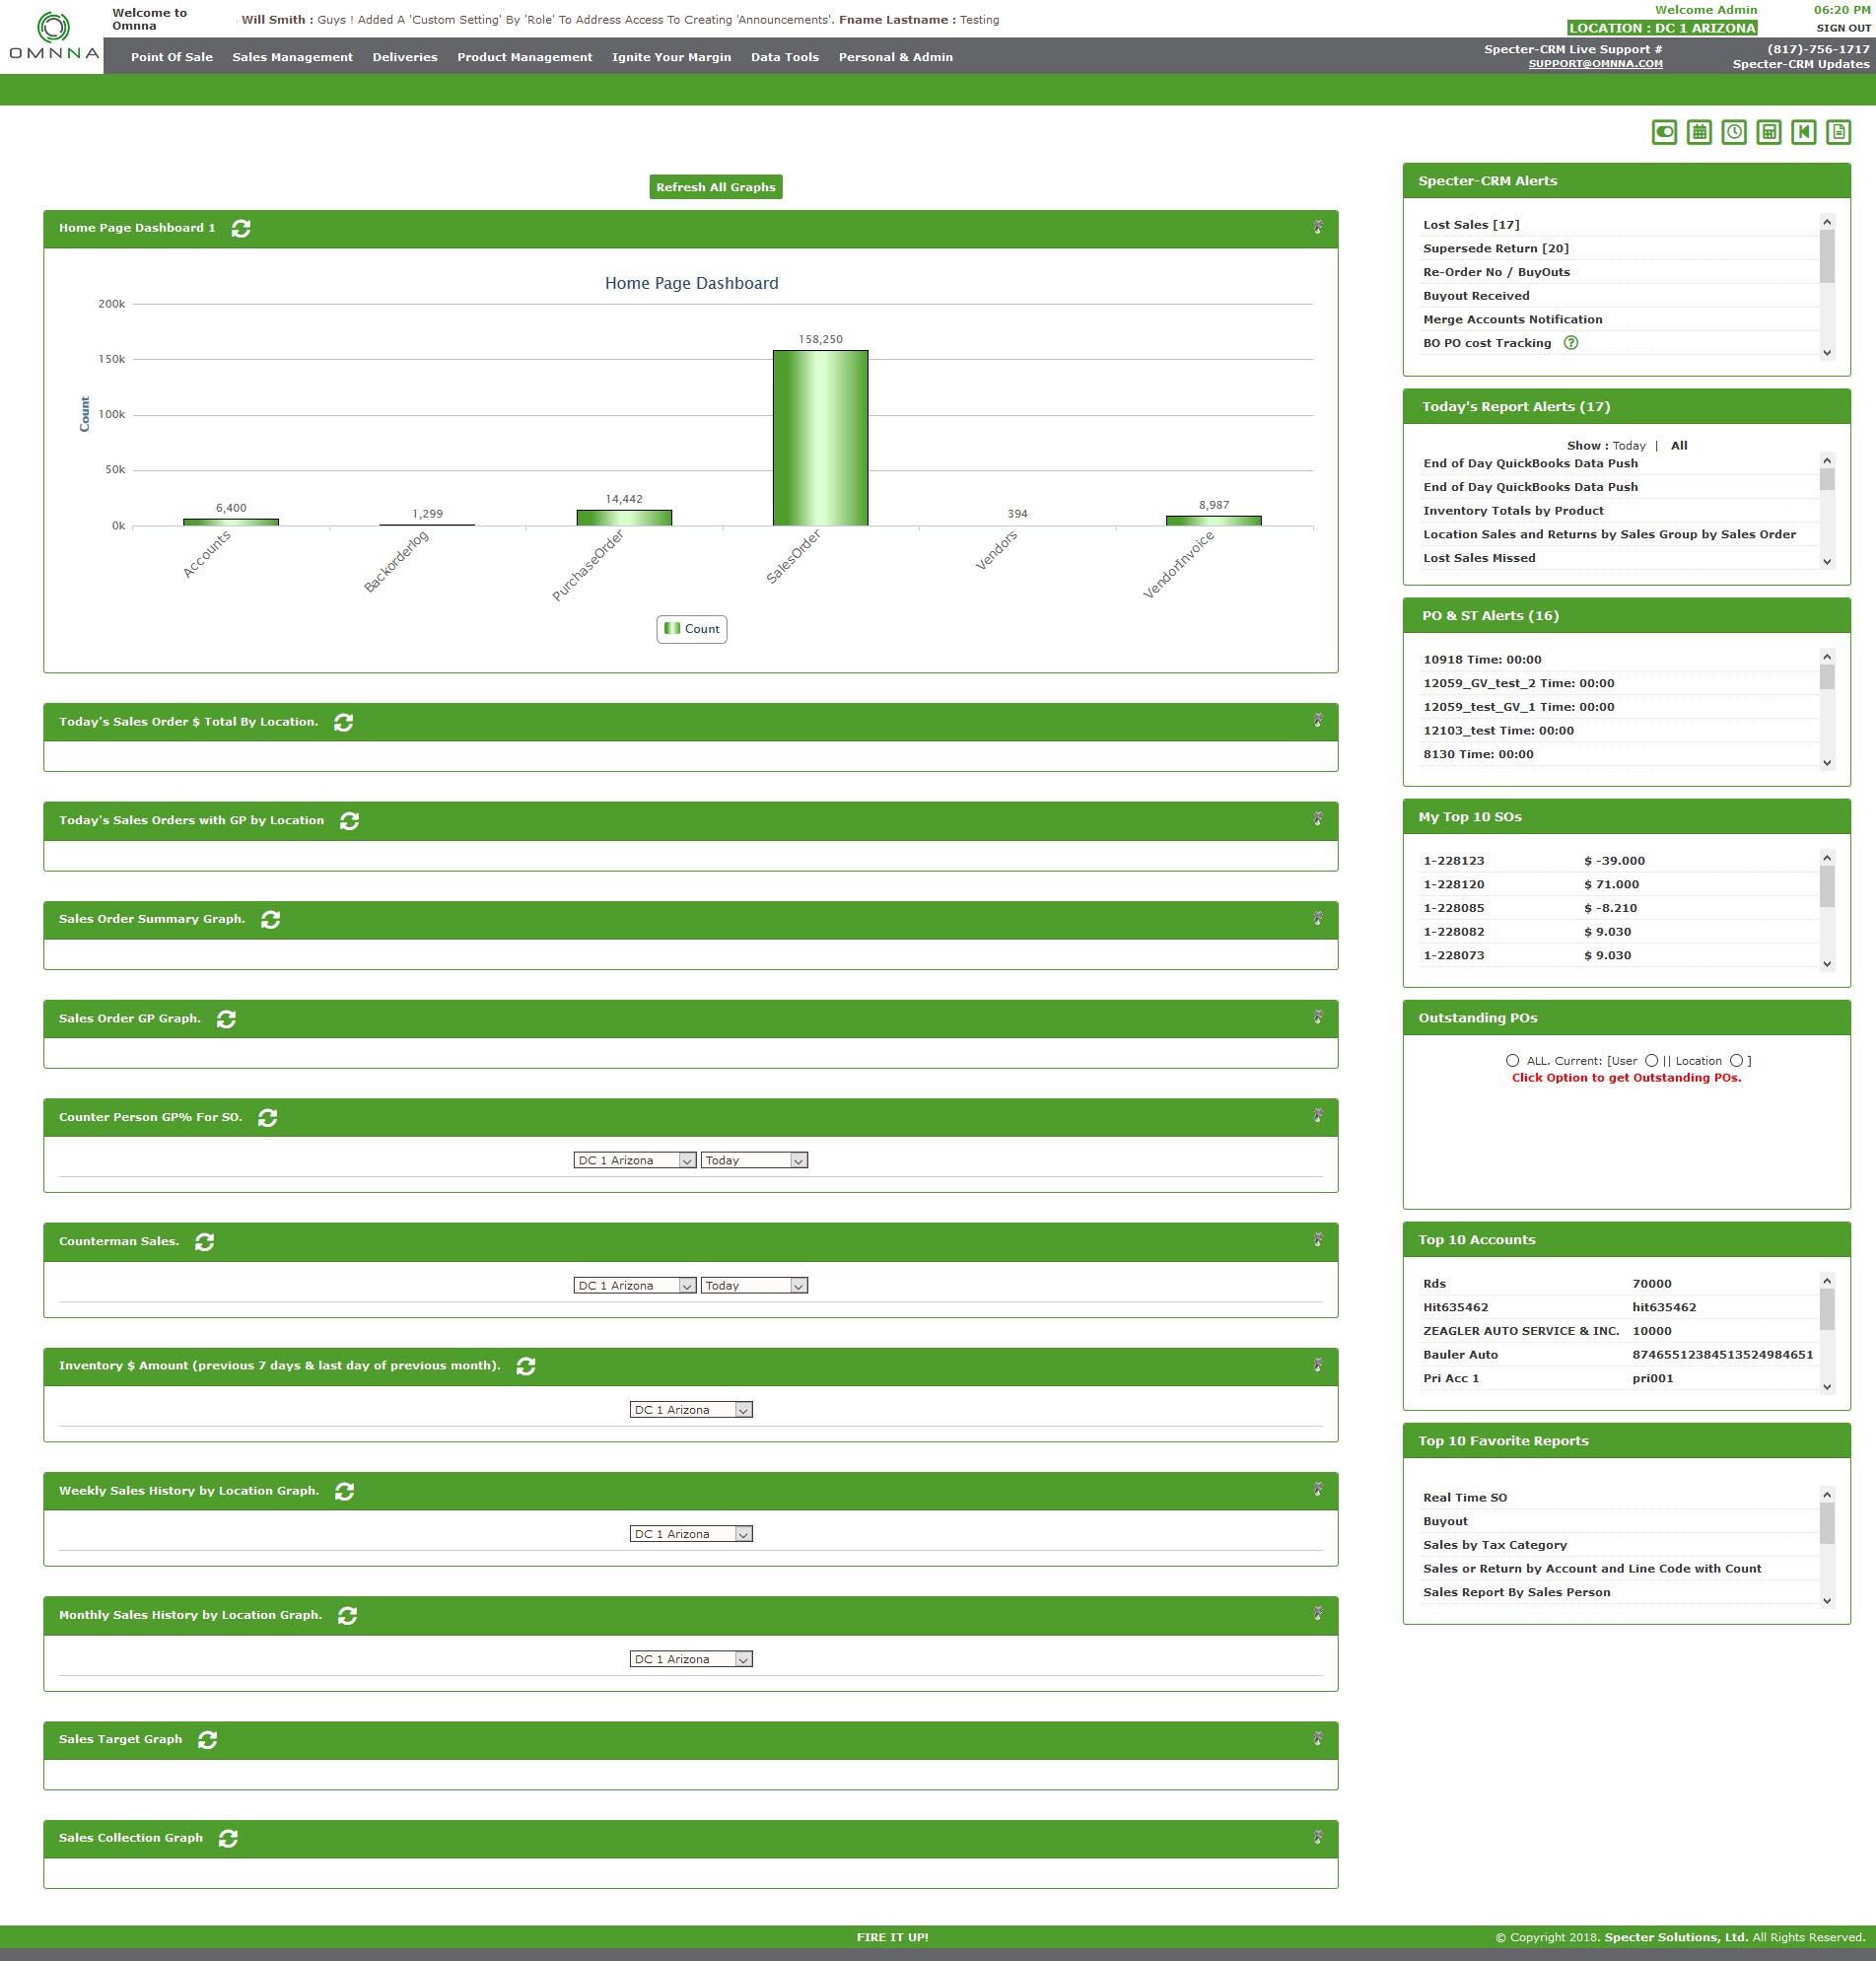 Omnna - Crest Infosystems Pvt Ltd